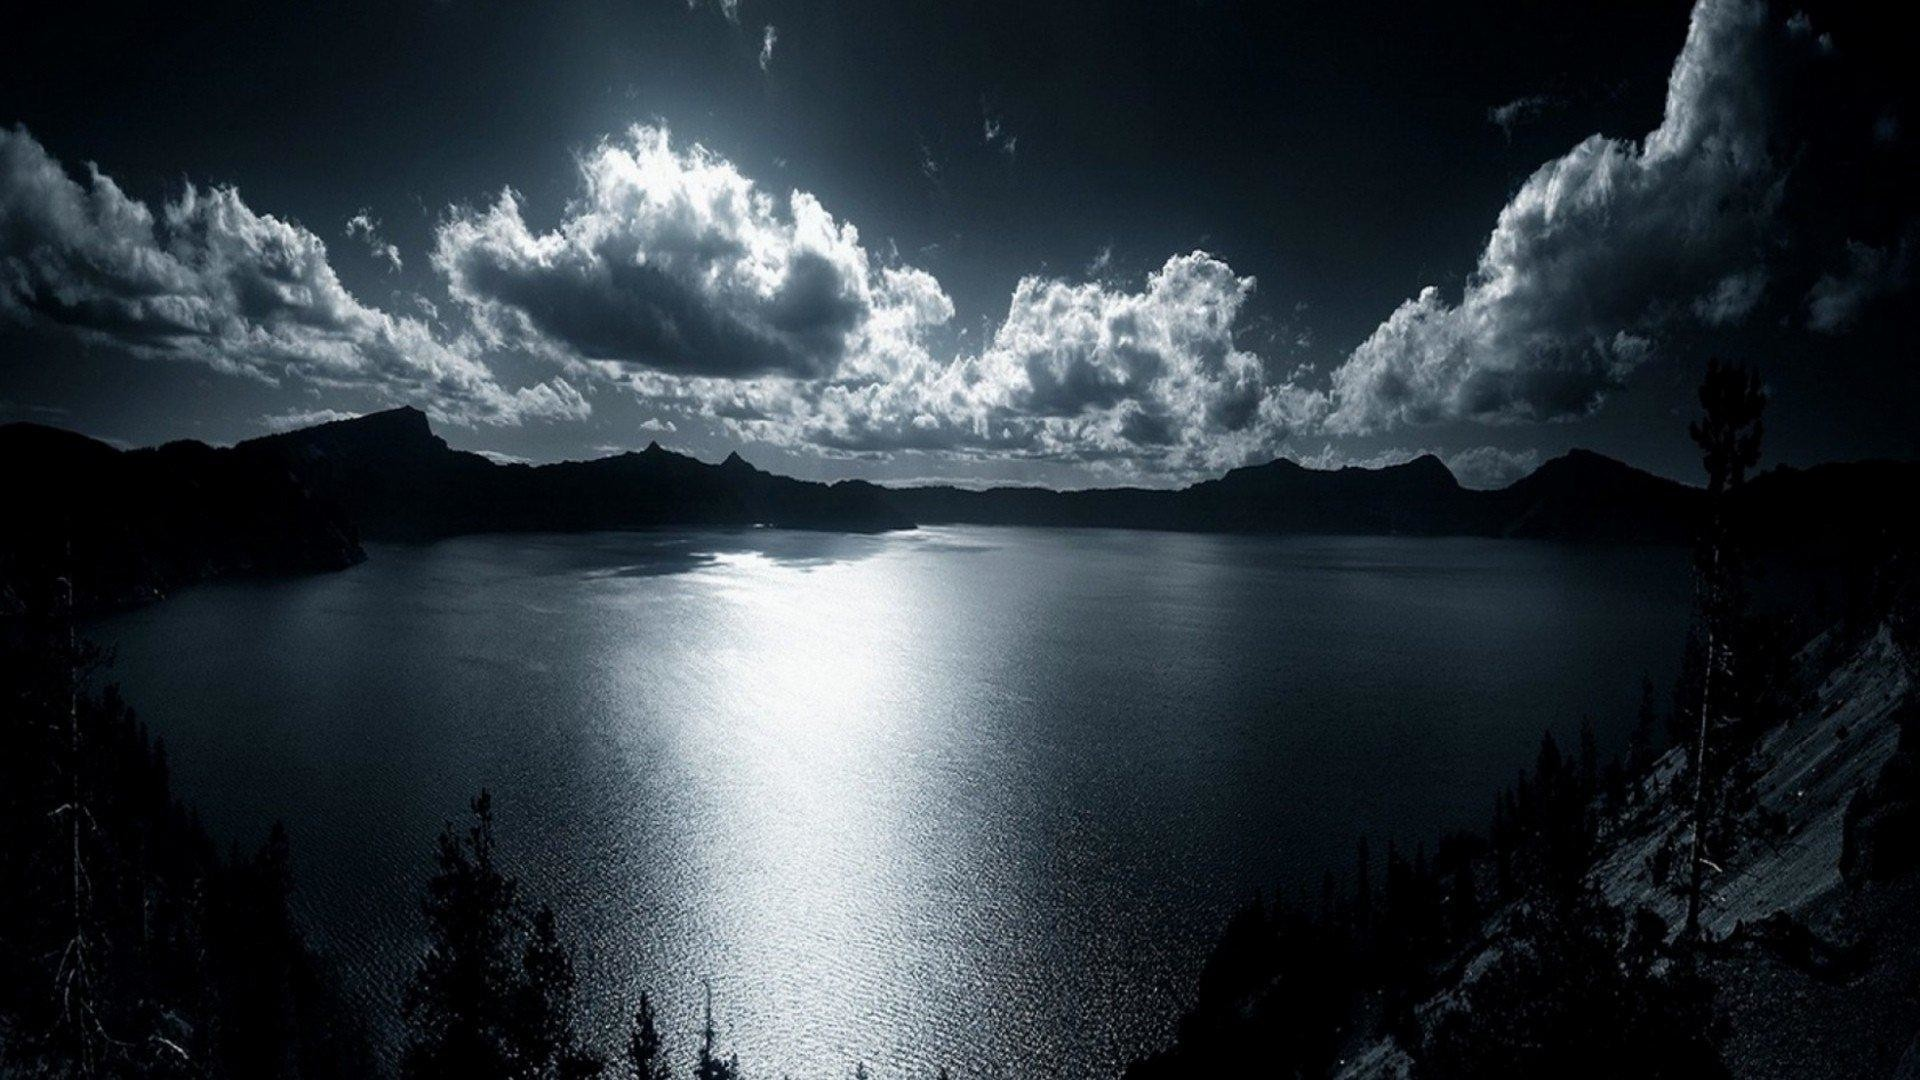 wallpaper.wiki-Download-Crater-Lake-Photo-PIC-WPB0011690